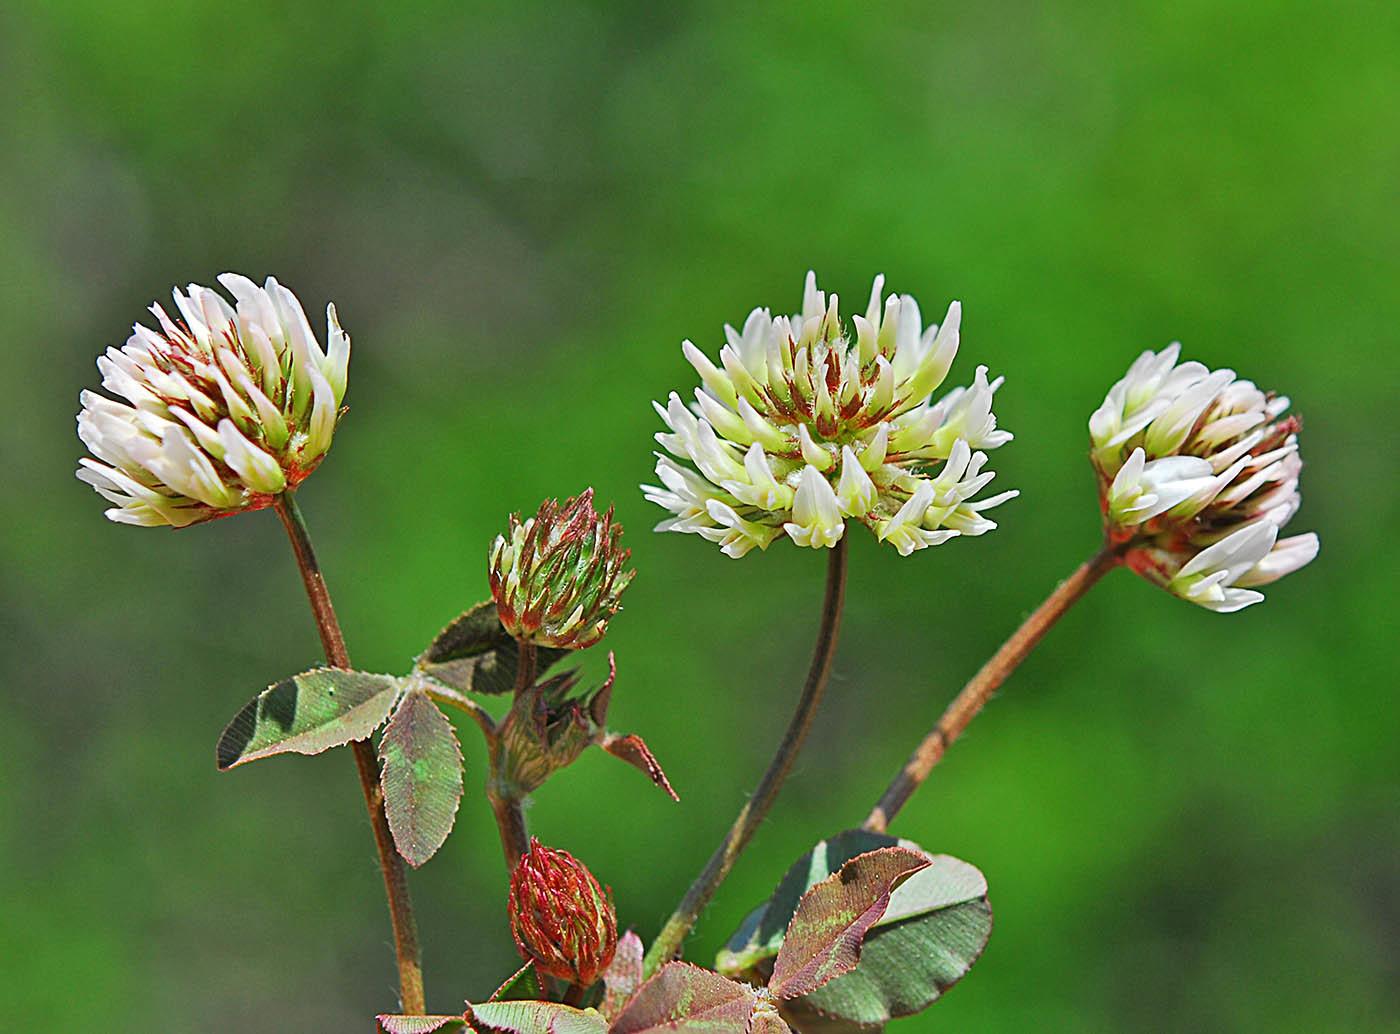 https://pictures.bgbm.org/digilib/Scaler?fn=Cyprus/Trifolium_physodes_B1.jpg&mo=file